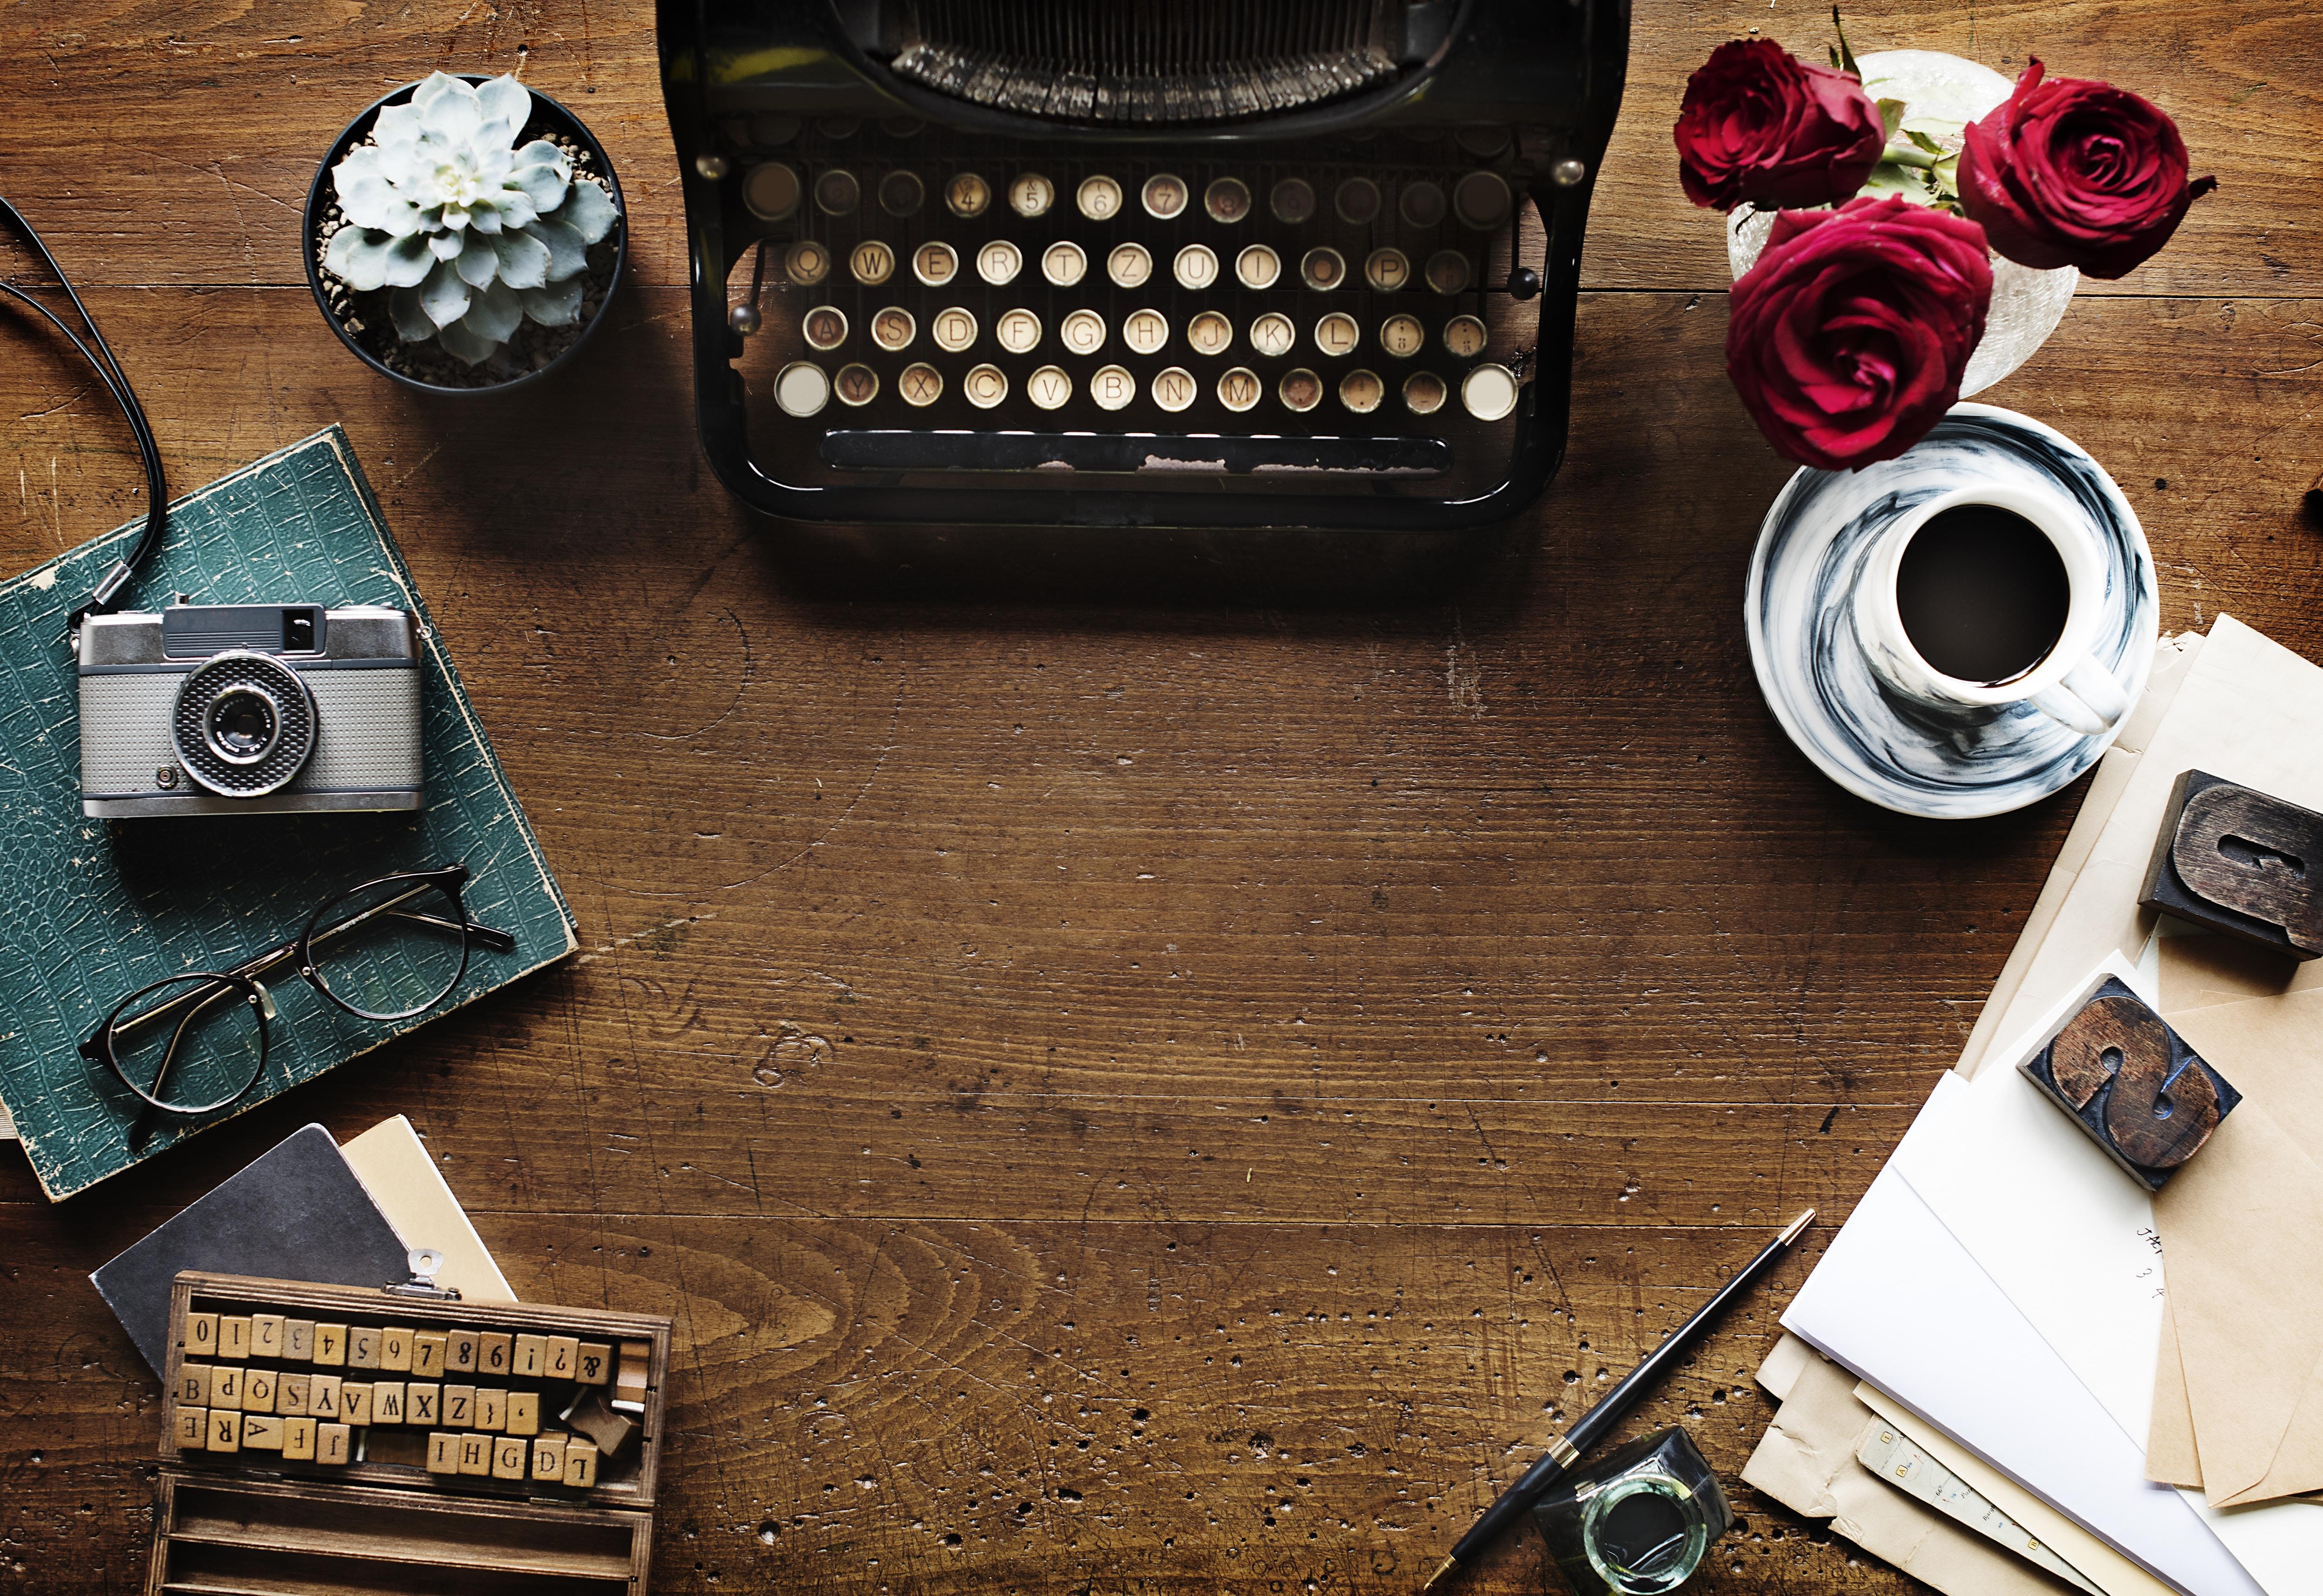 black typewriter near gray camera on brown wooden surface